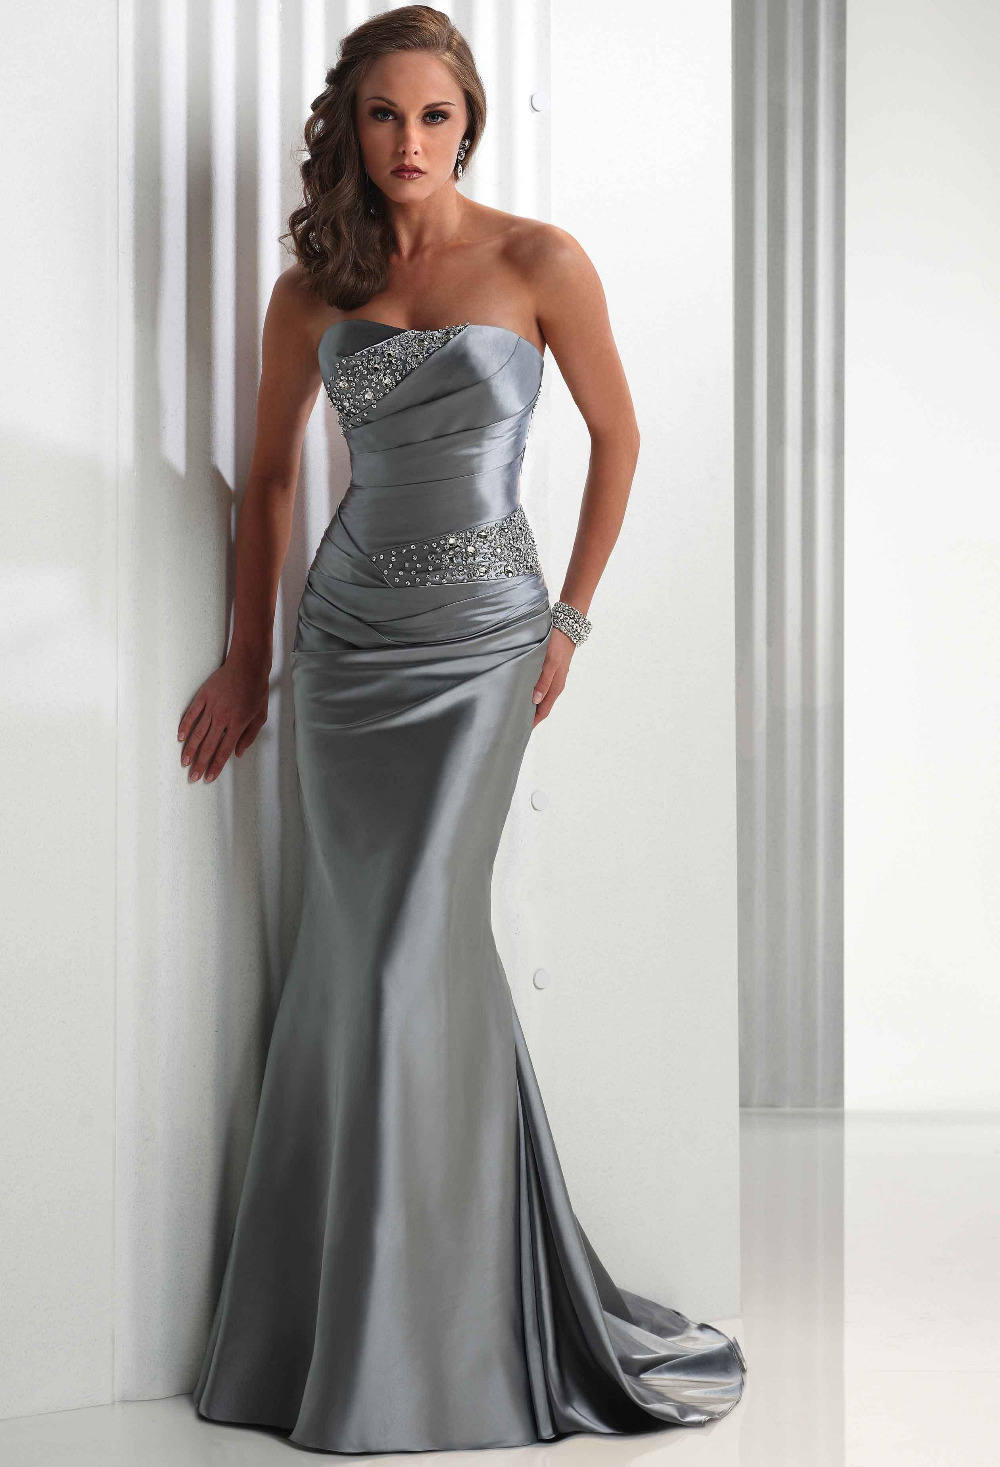 wedding dresses silver wedding dresses wedding dresses bridal gowns wedding gowns silver wedding dress beautiful silver and